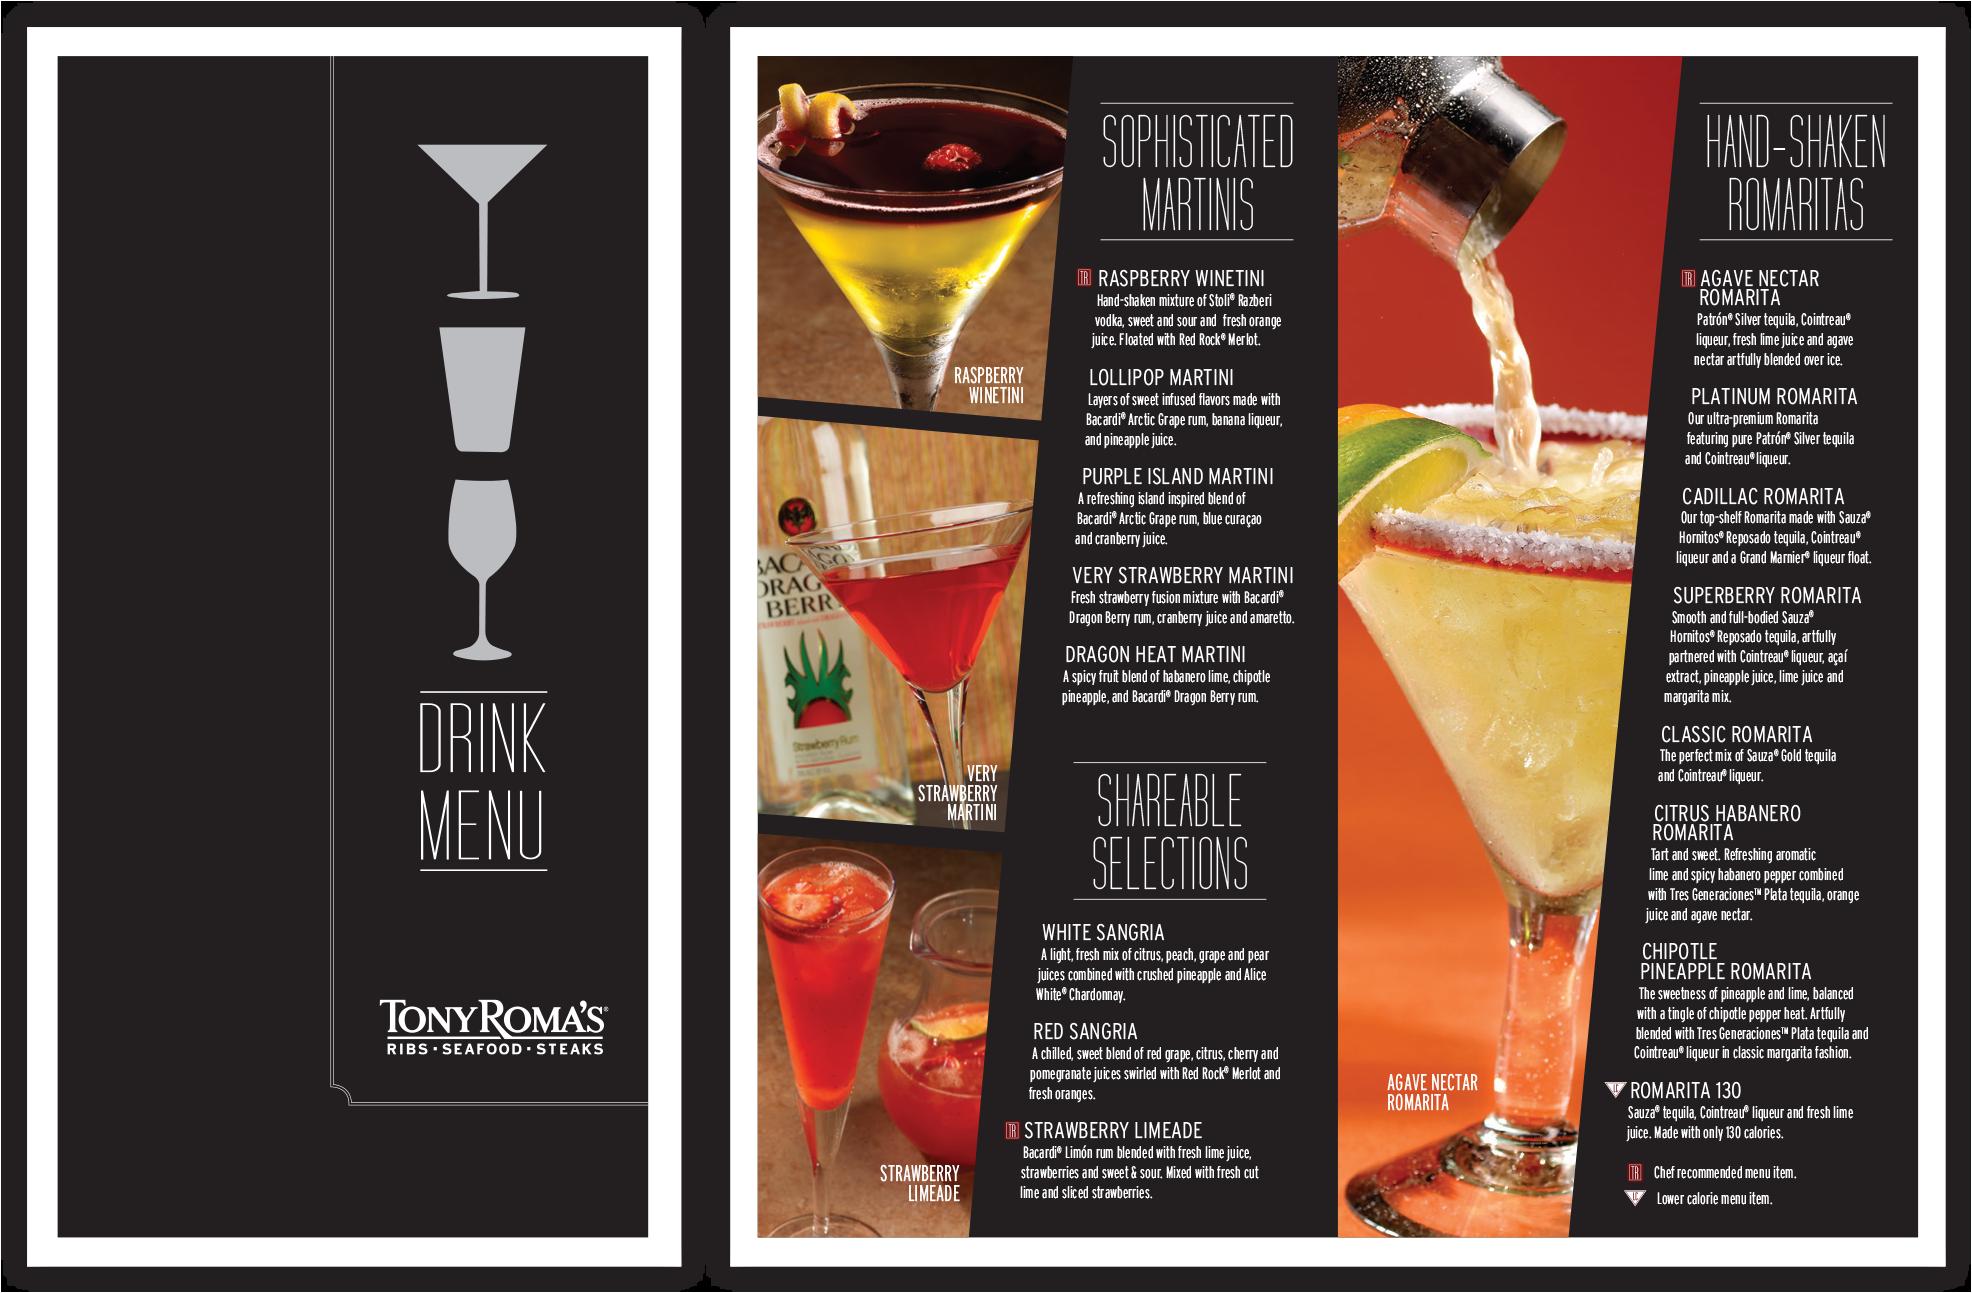 tr s drink menu 2012 design pinterest menu design drink menu